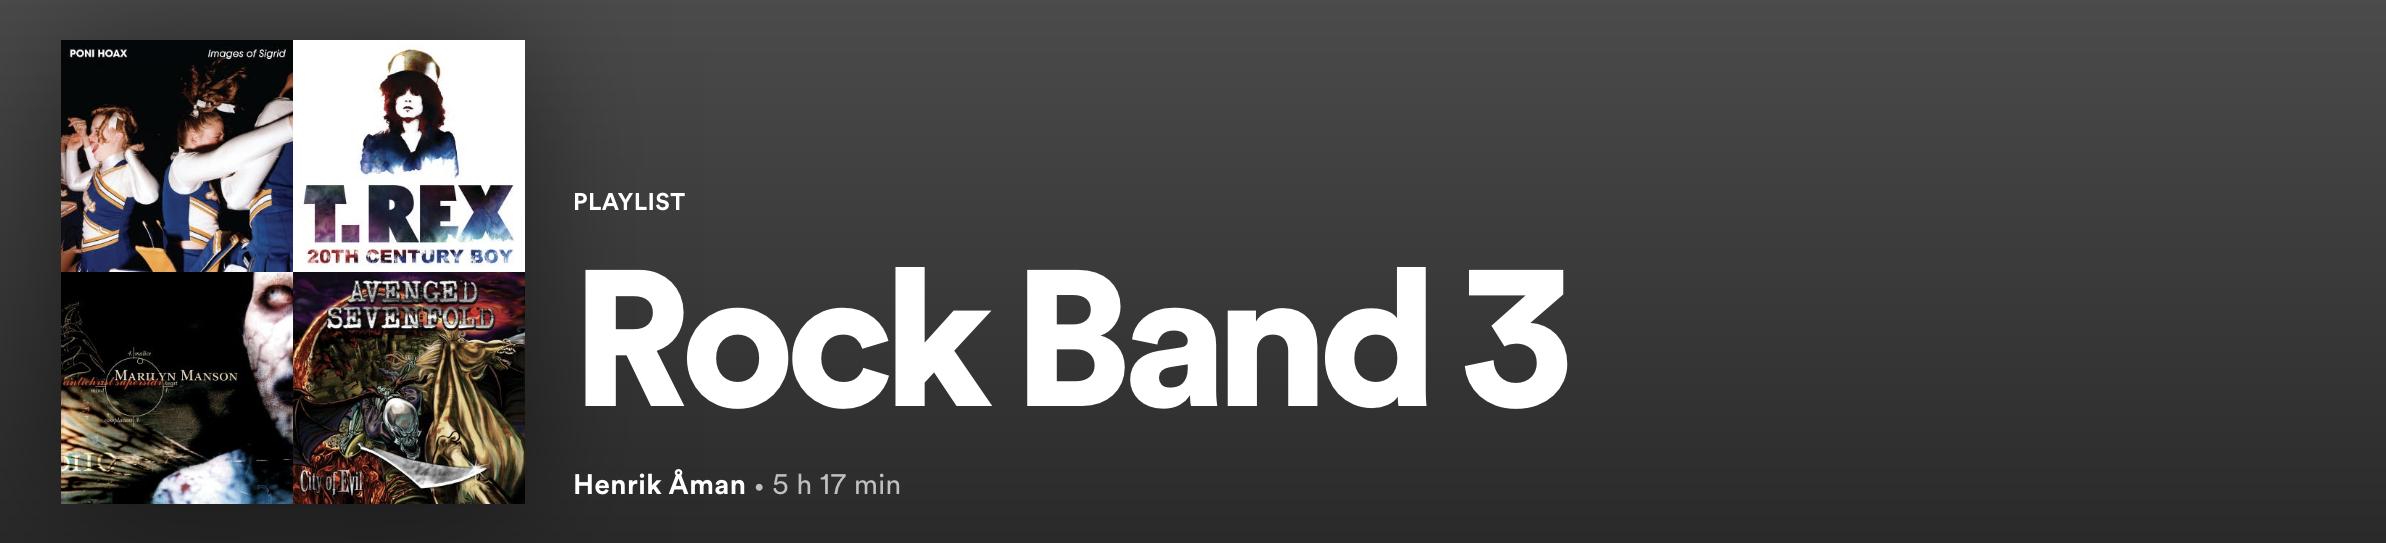 Rock Band 3 Spotify